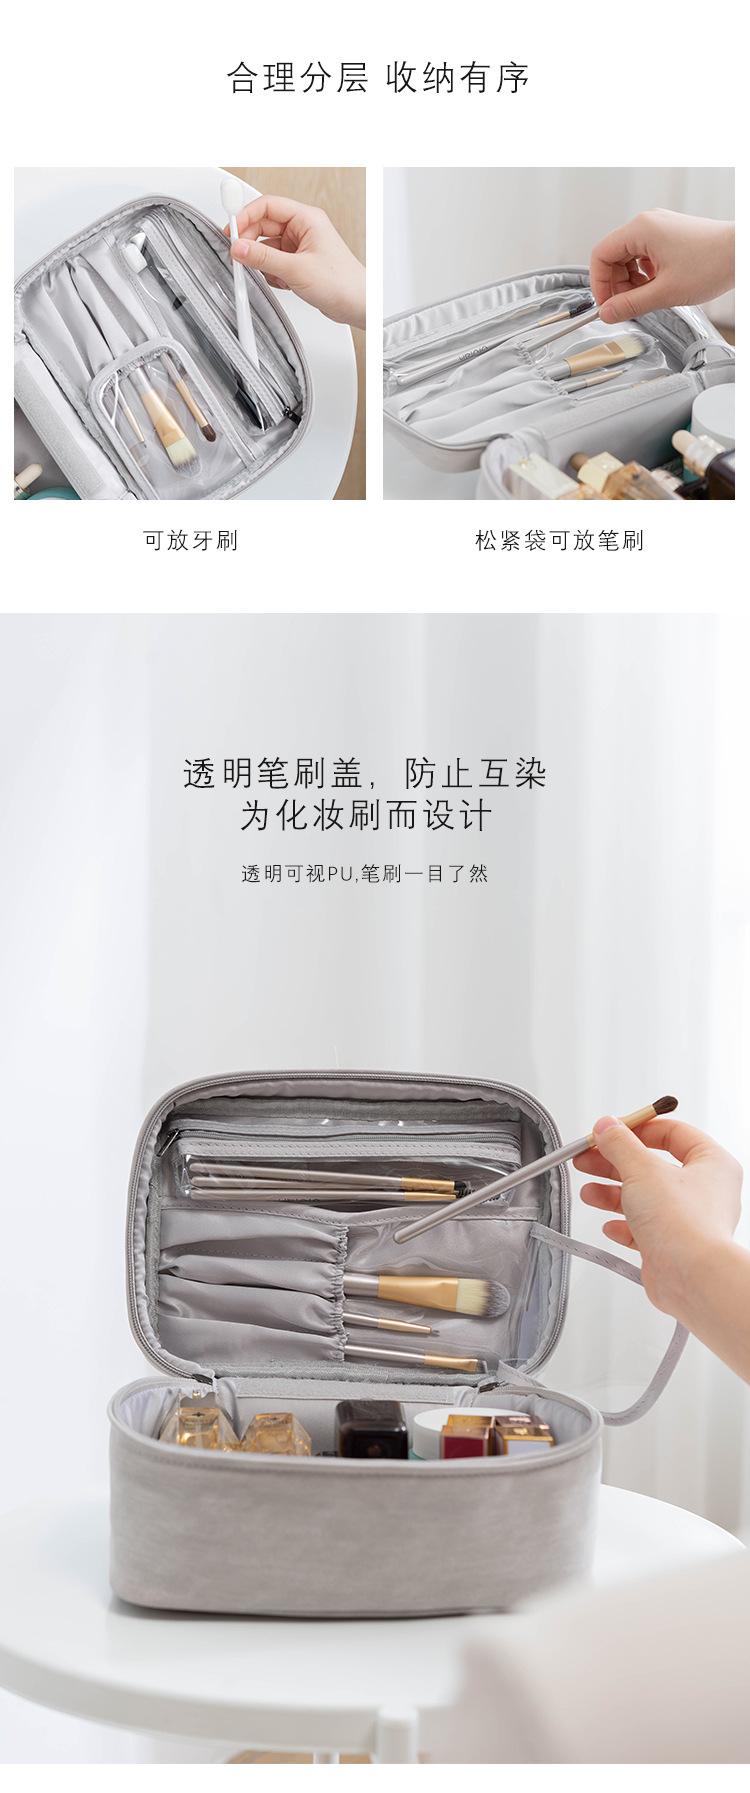 Cosmetic Bag_05.jpg